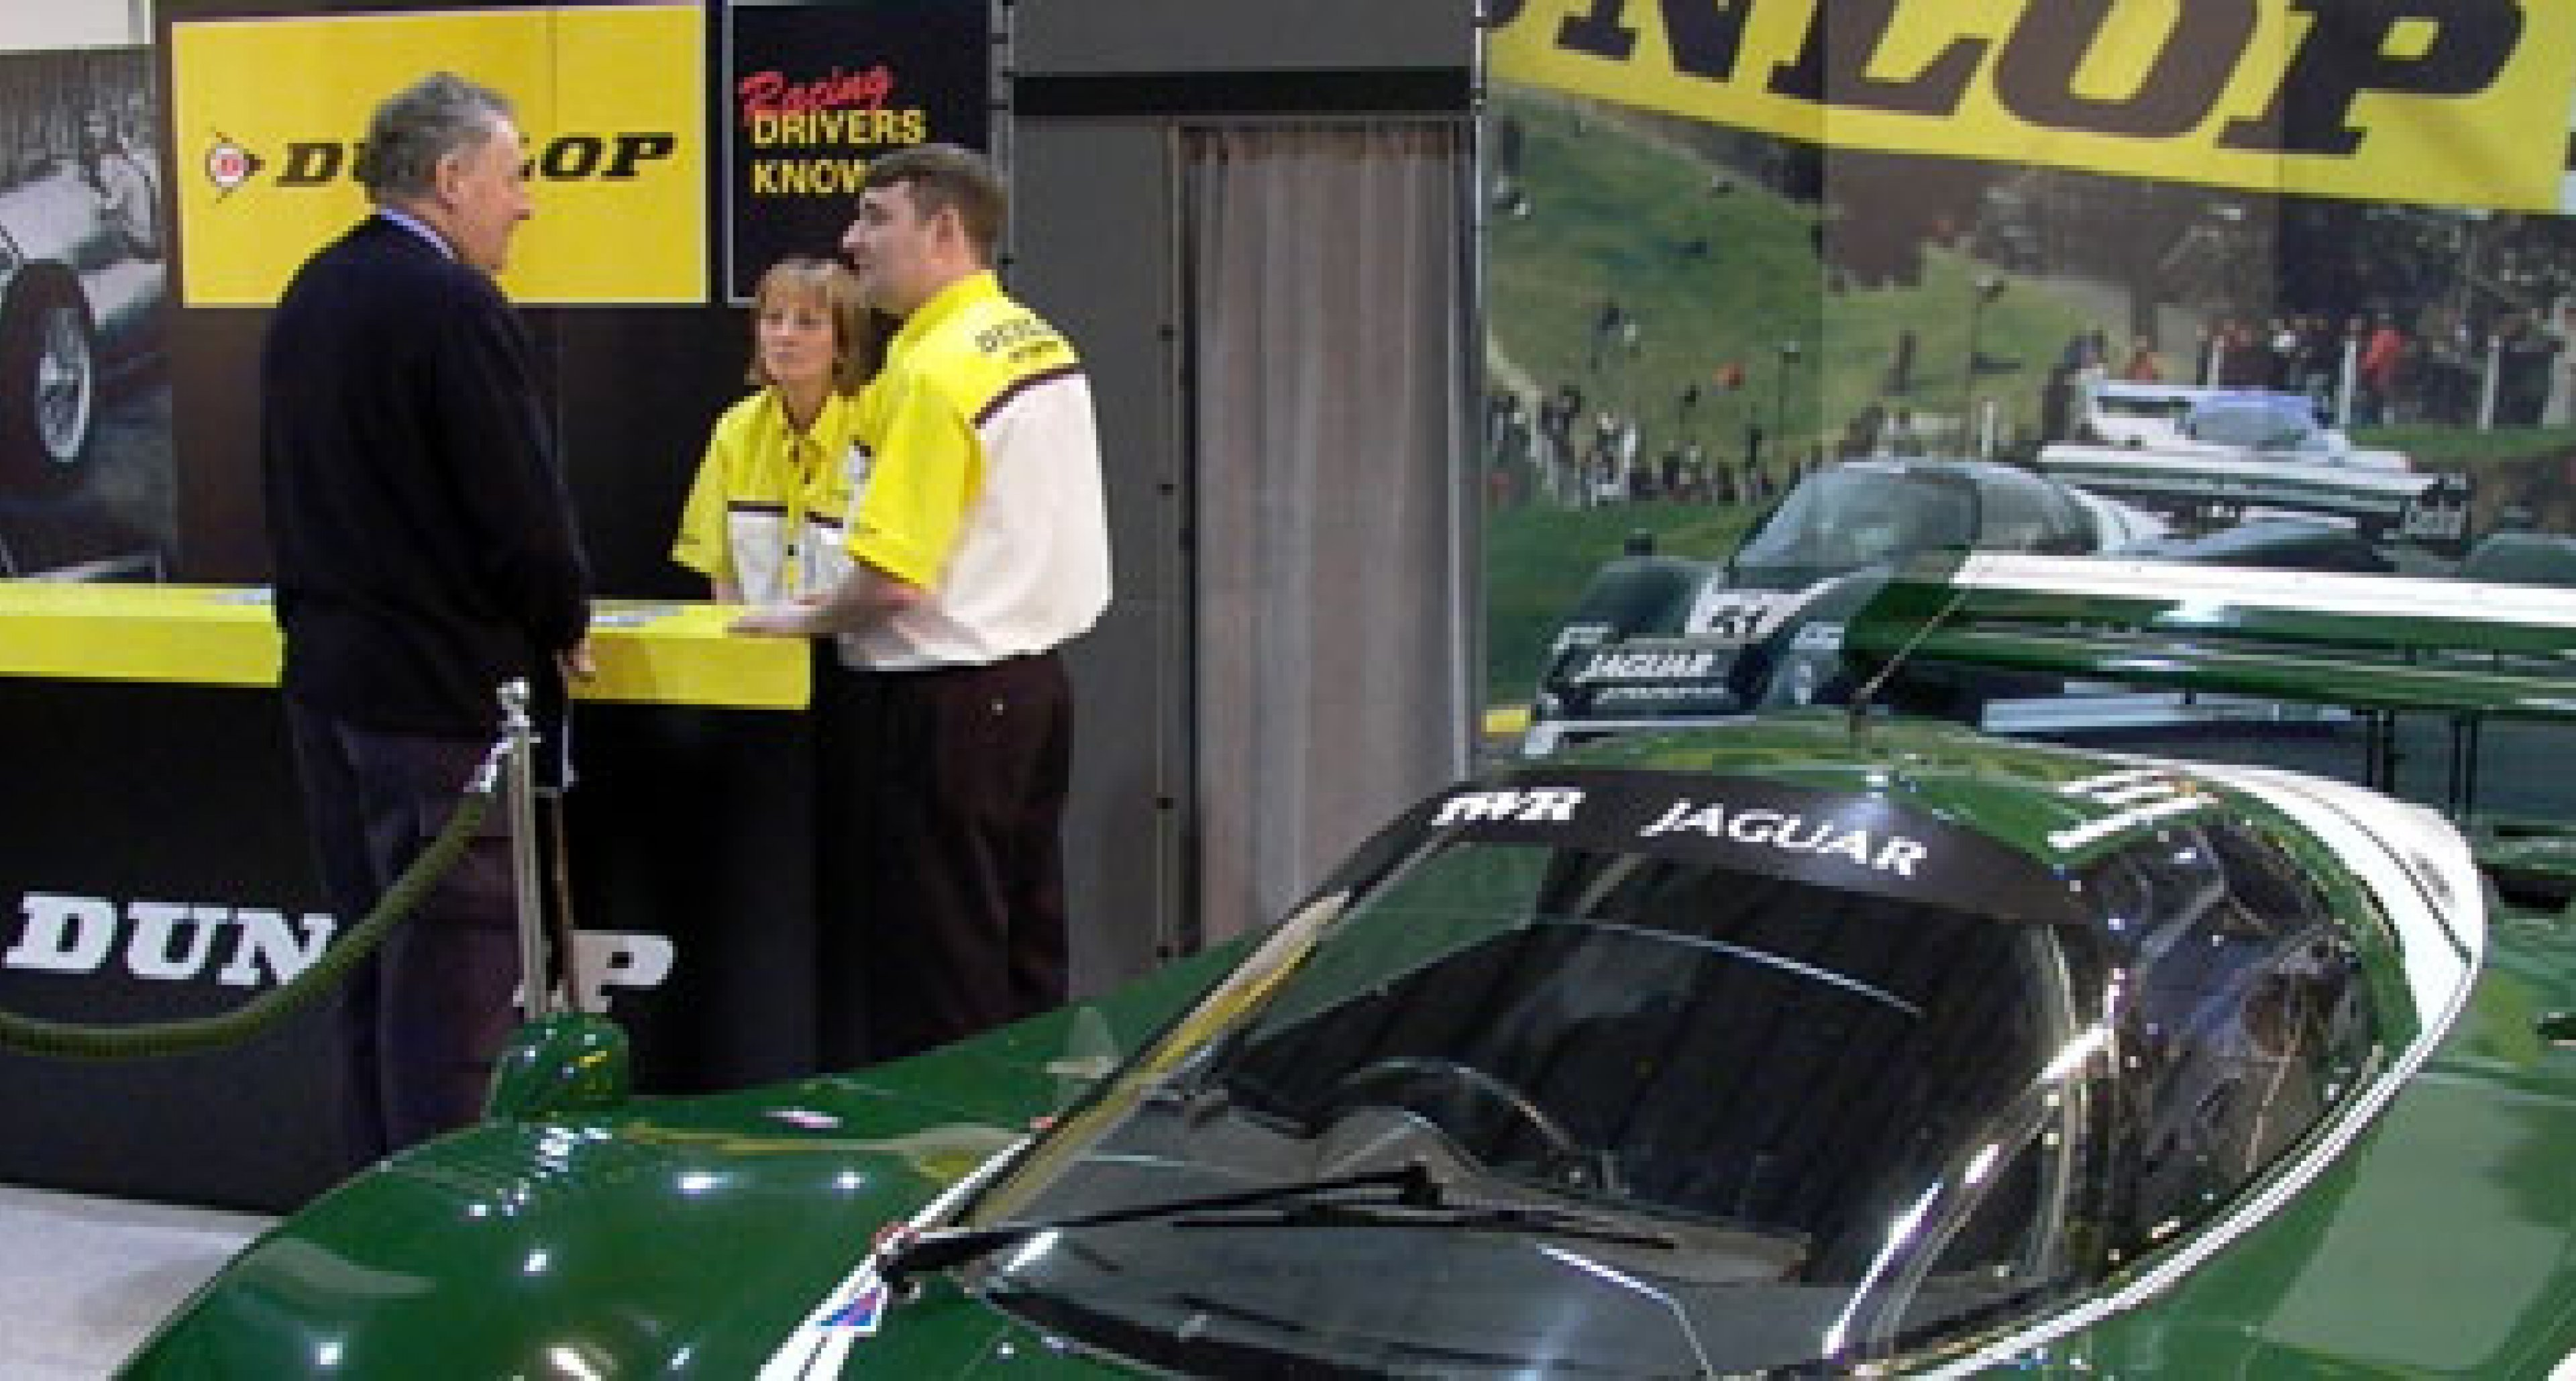 International Historic Motorsport Show 2004